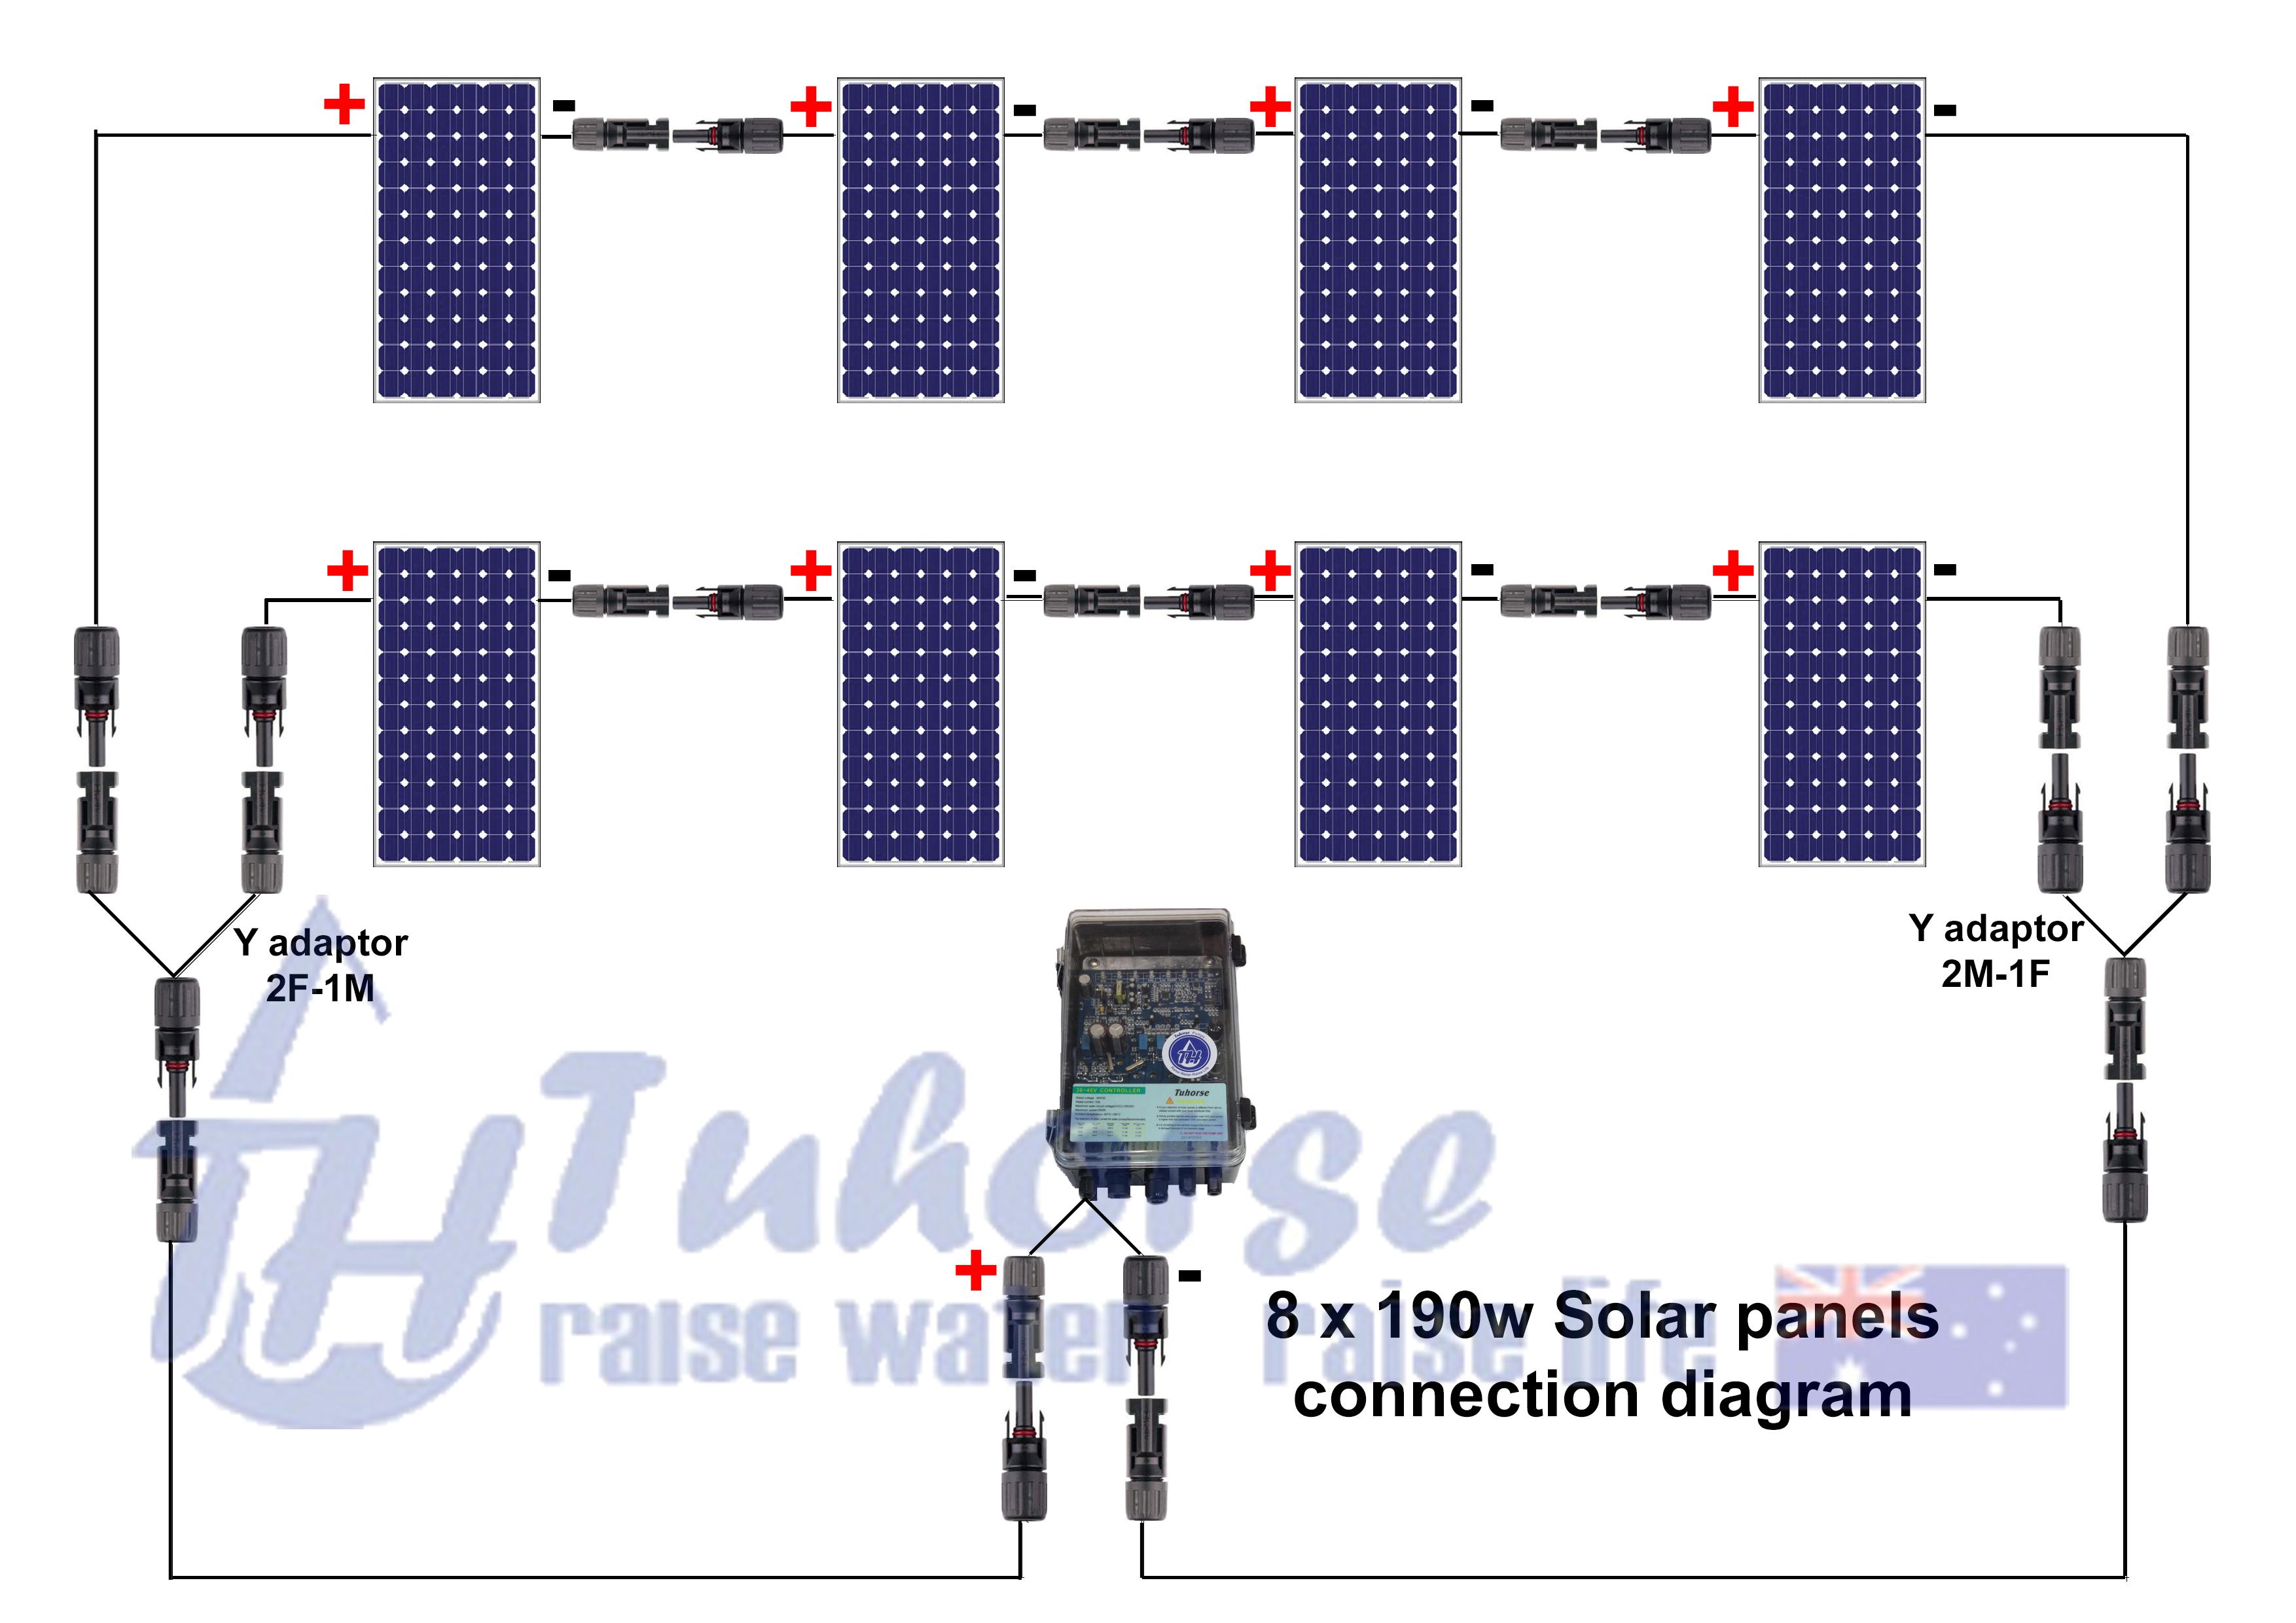 solar panel system wiring diagram midnight box wiring diagram solar inverter wiring diagram solar panel wiring diagram uk [ 3508 x 2480 Pixel ]